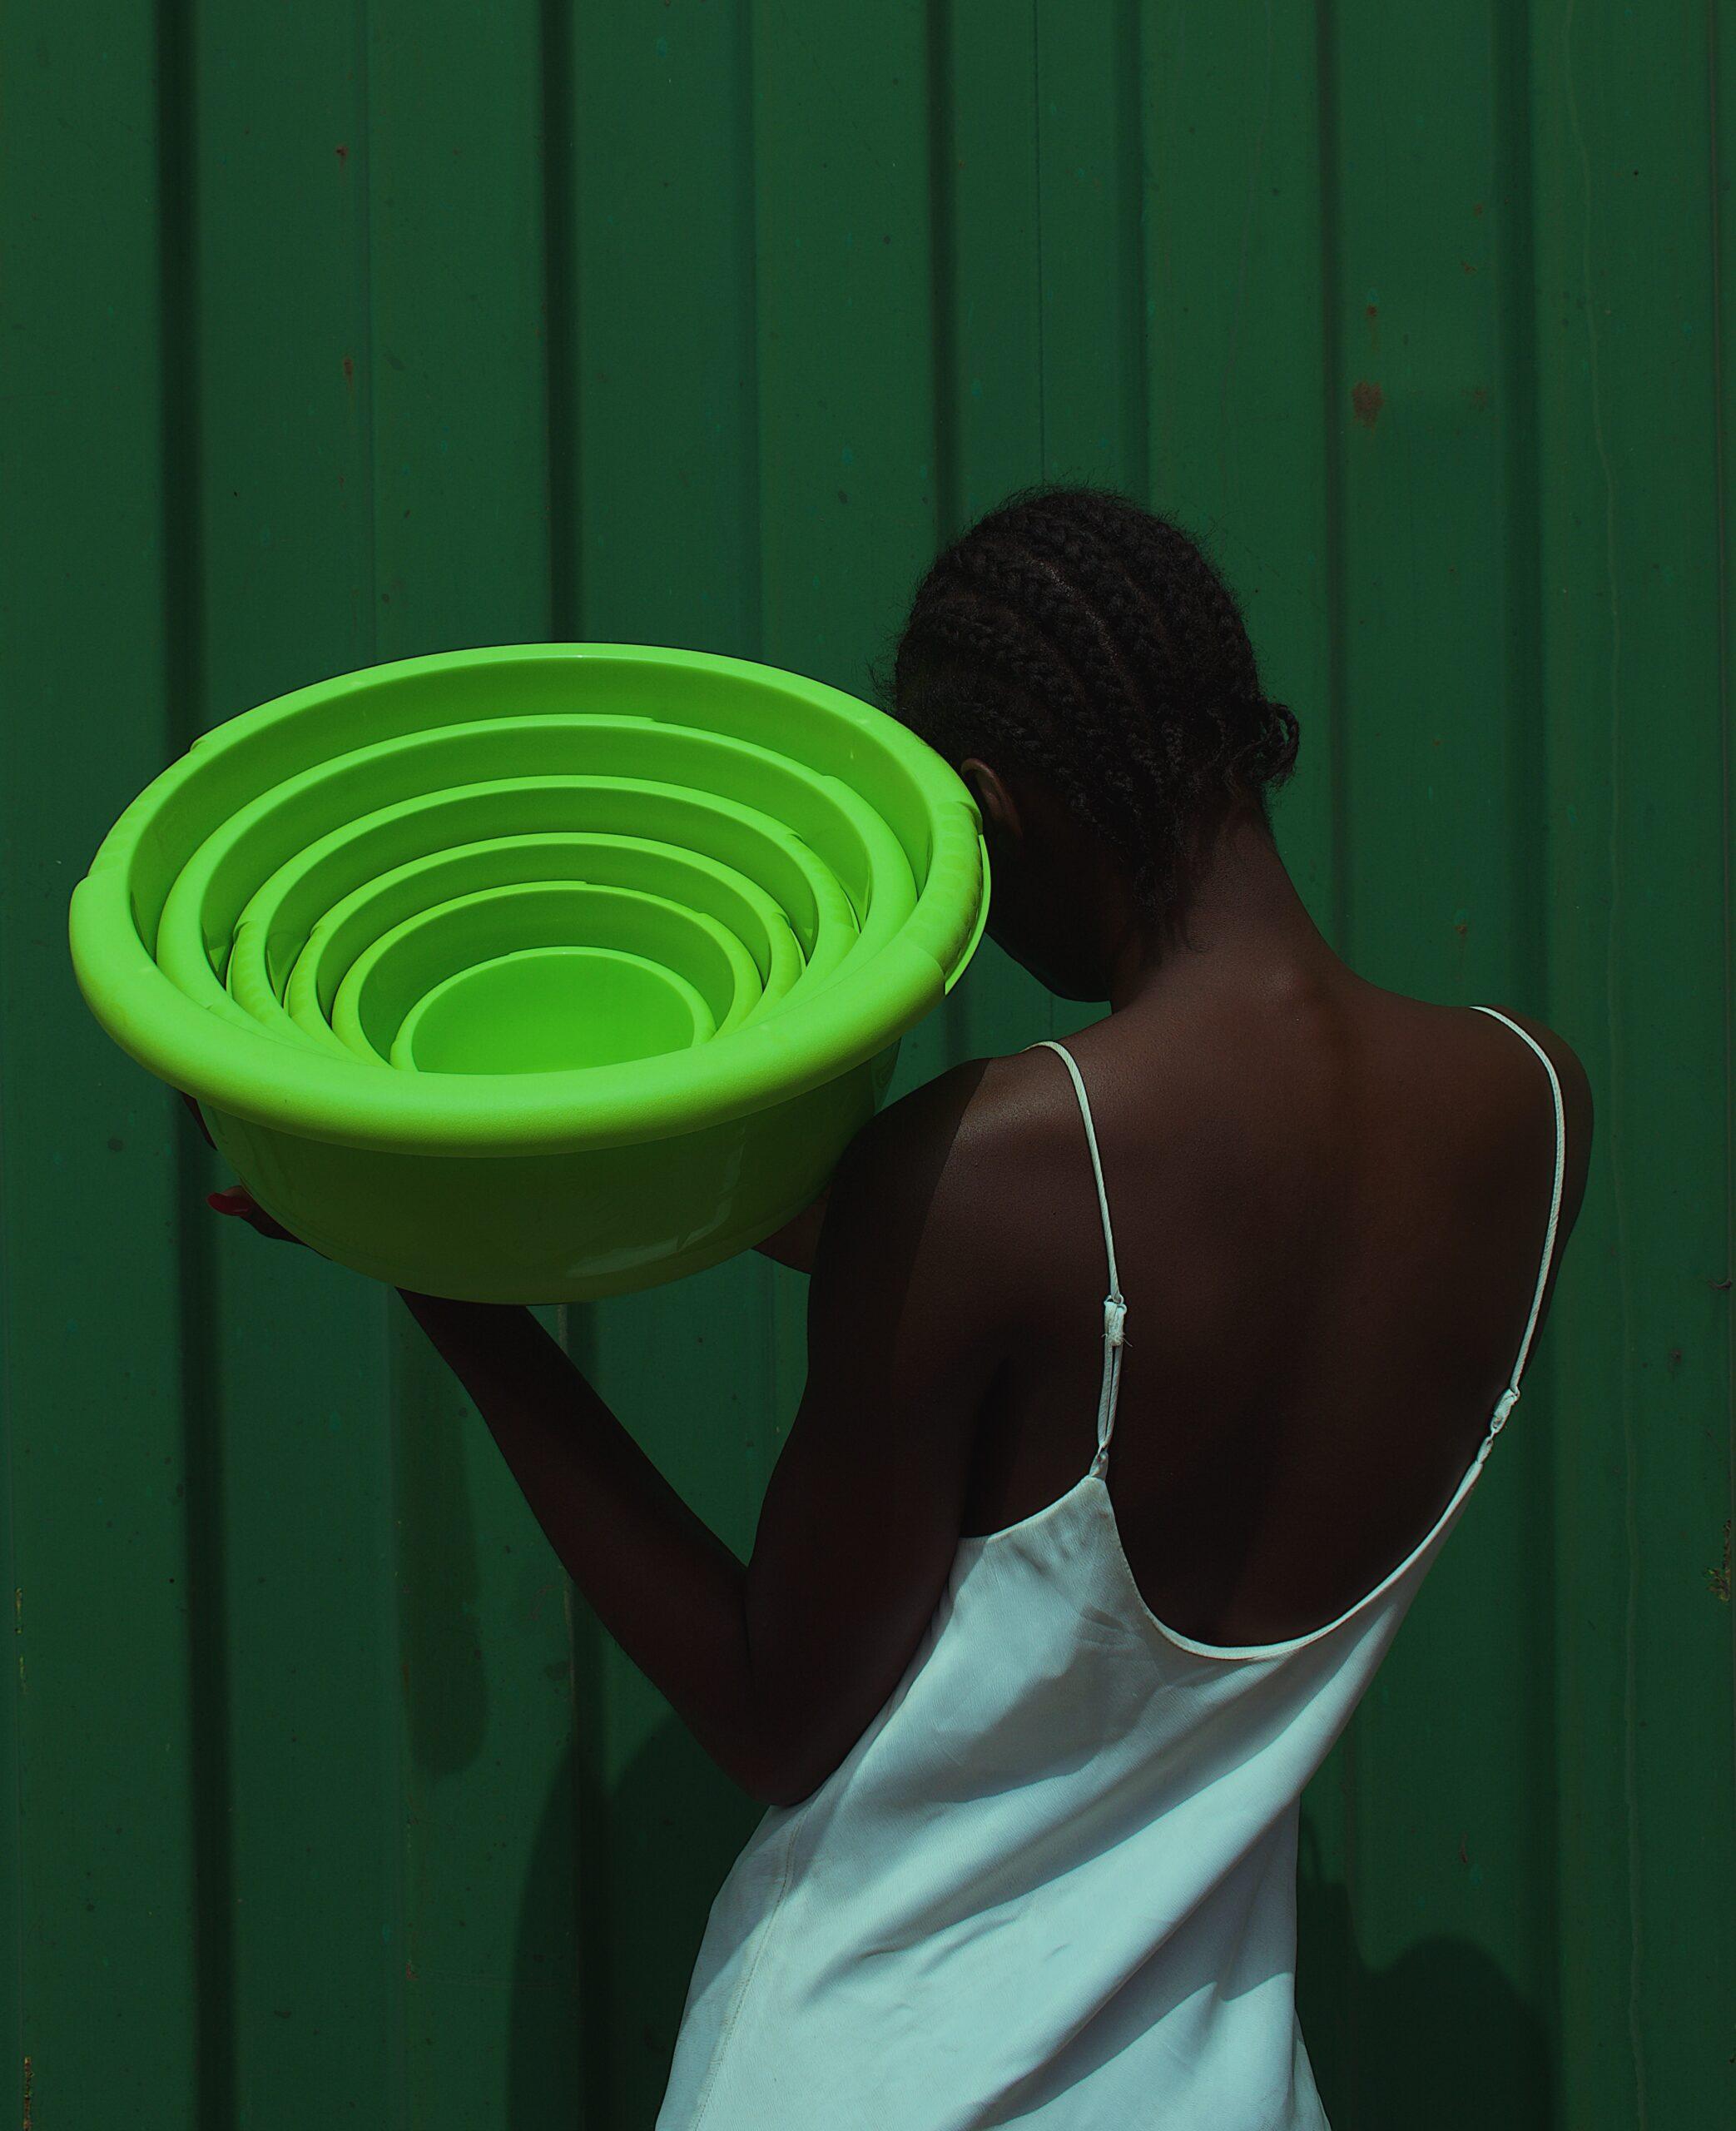 Keren Lasme 的彩色肖像照片